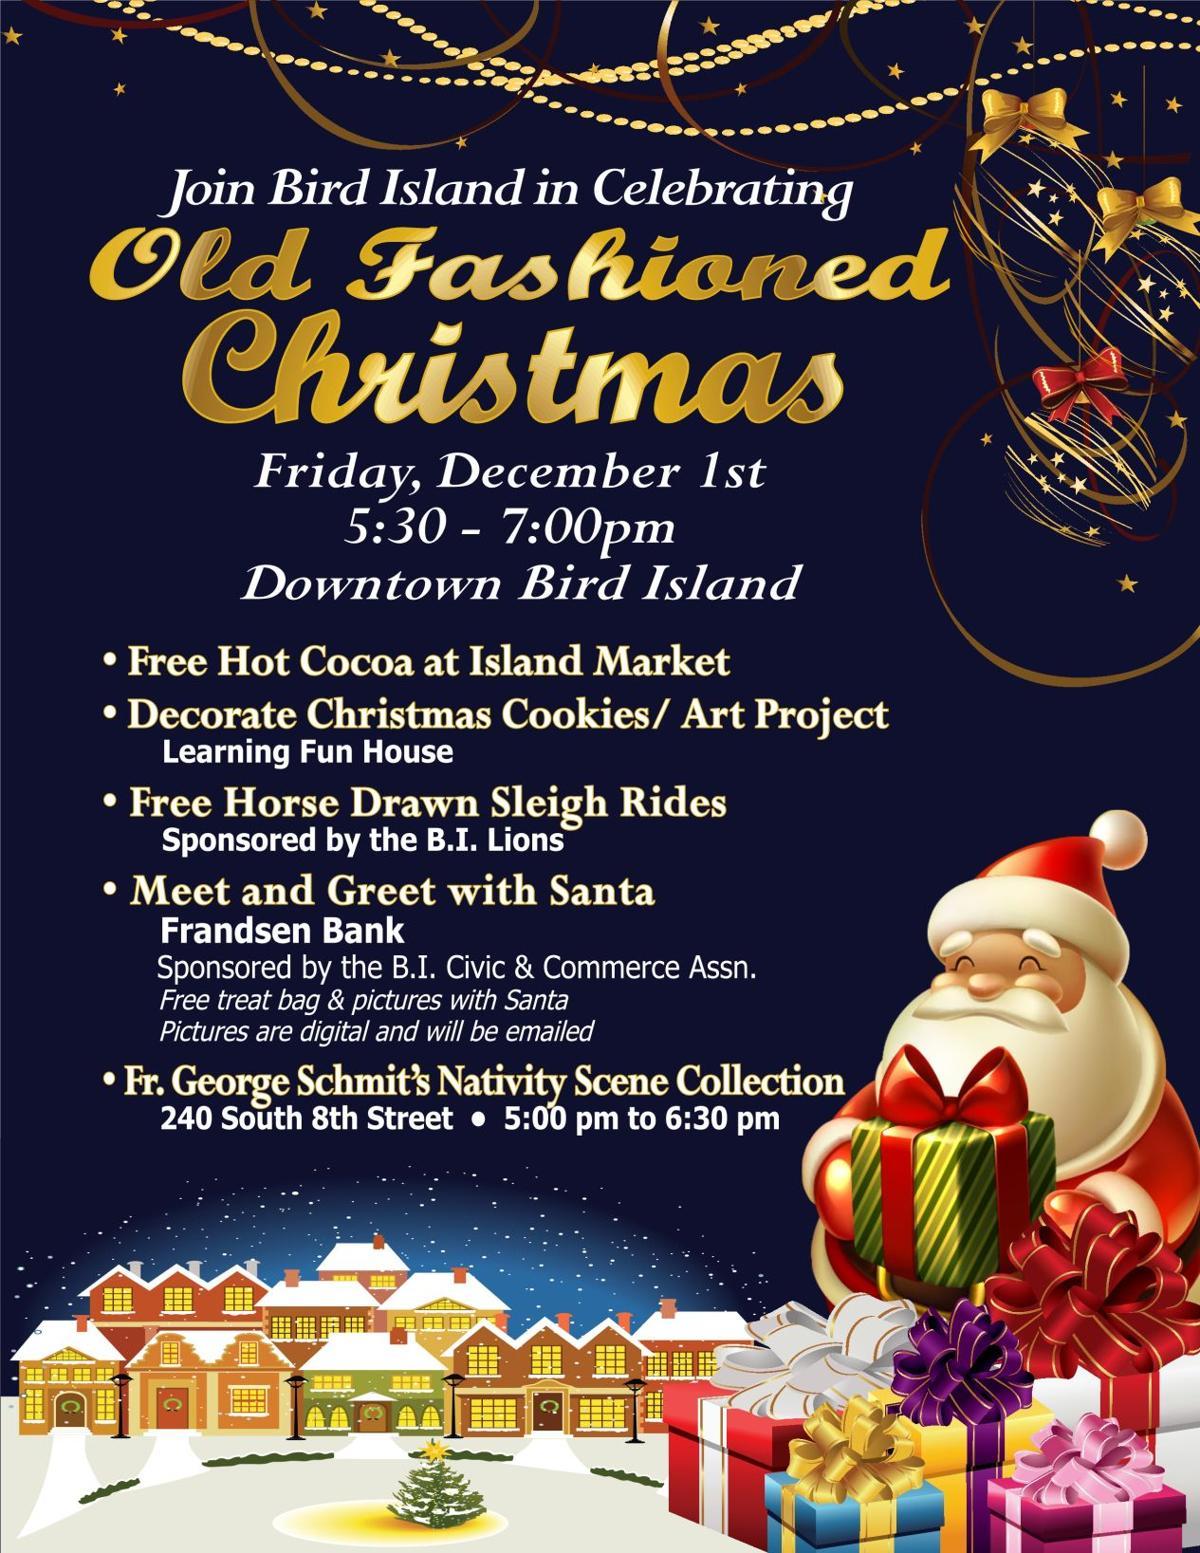 Old Fashioned Christmas | Calendar | willmarradio.com